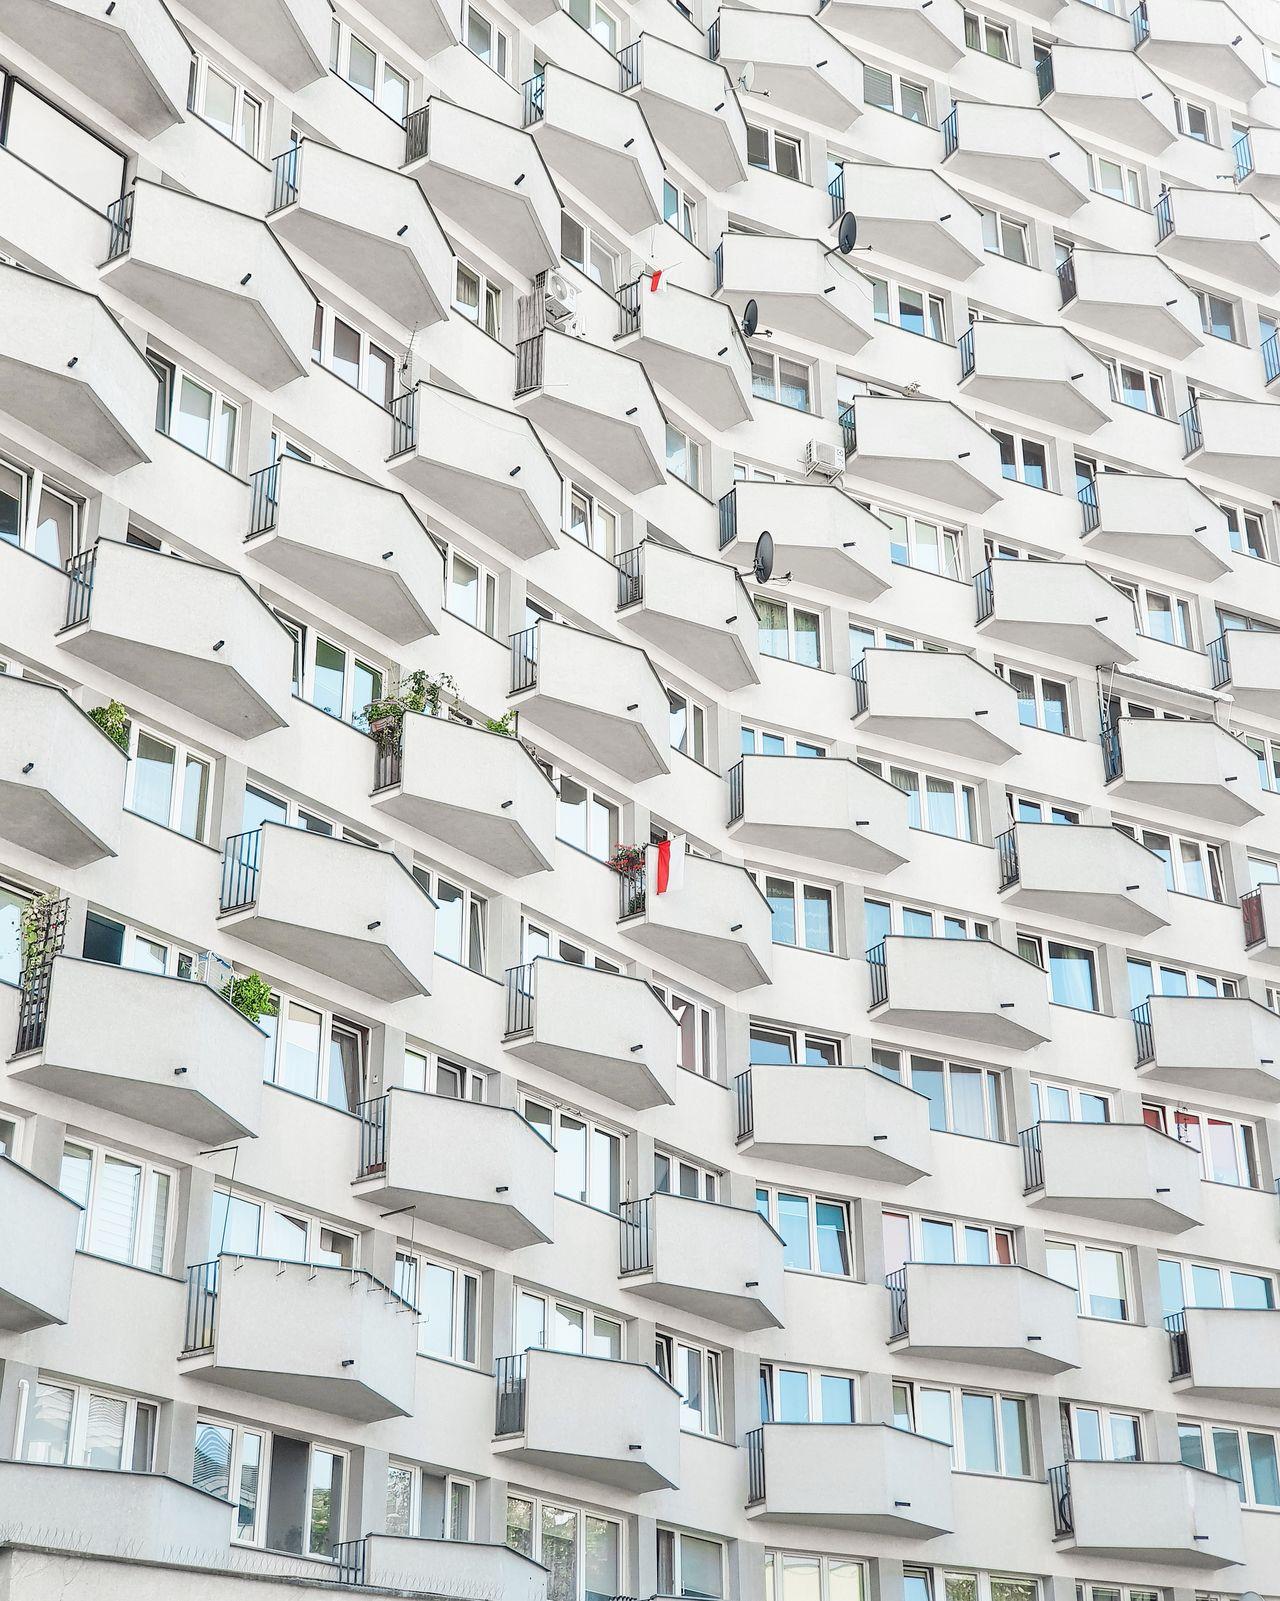 architecture, built structure, building exterior, building, low angle view